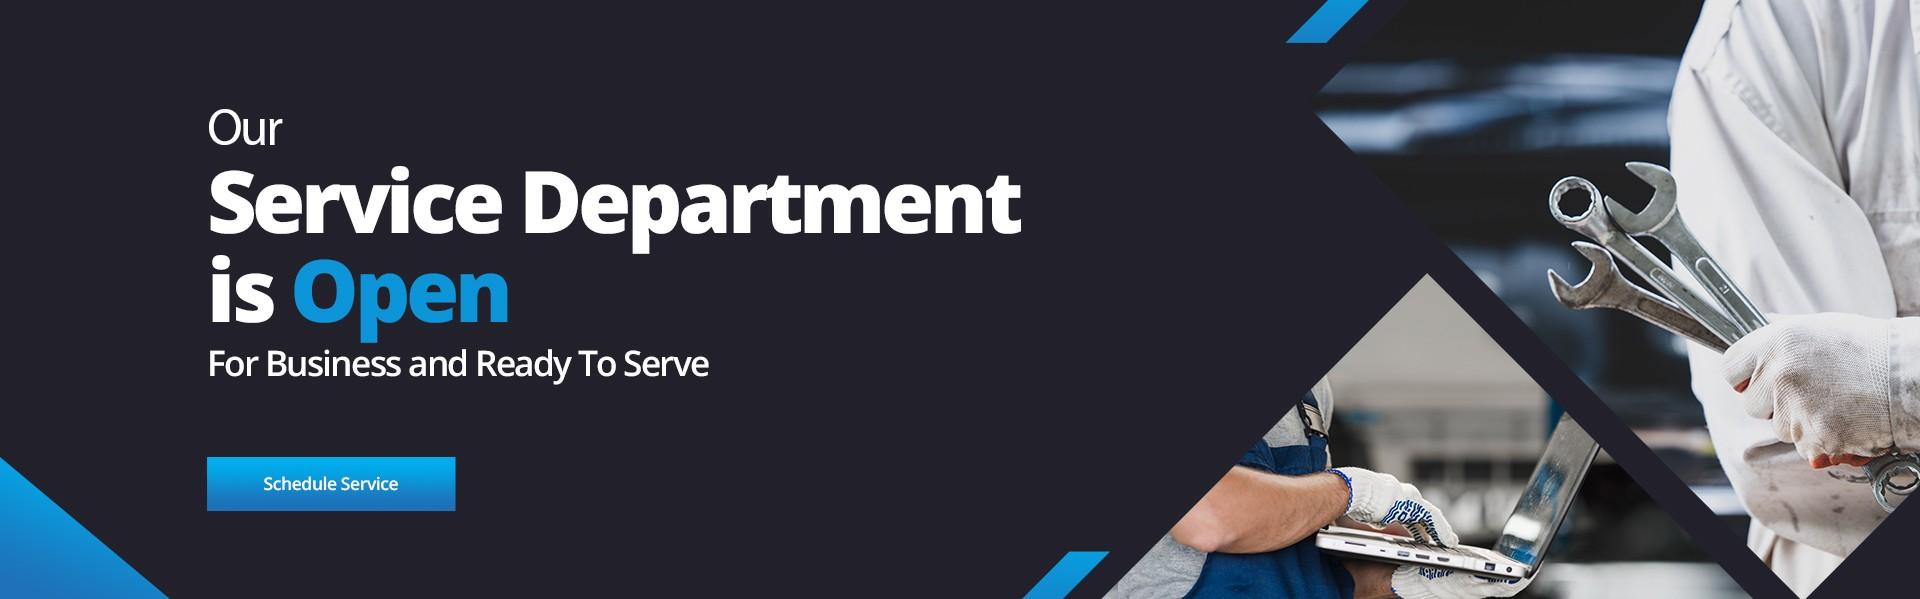 Service Department is Open